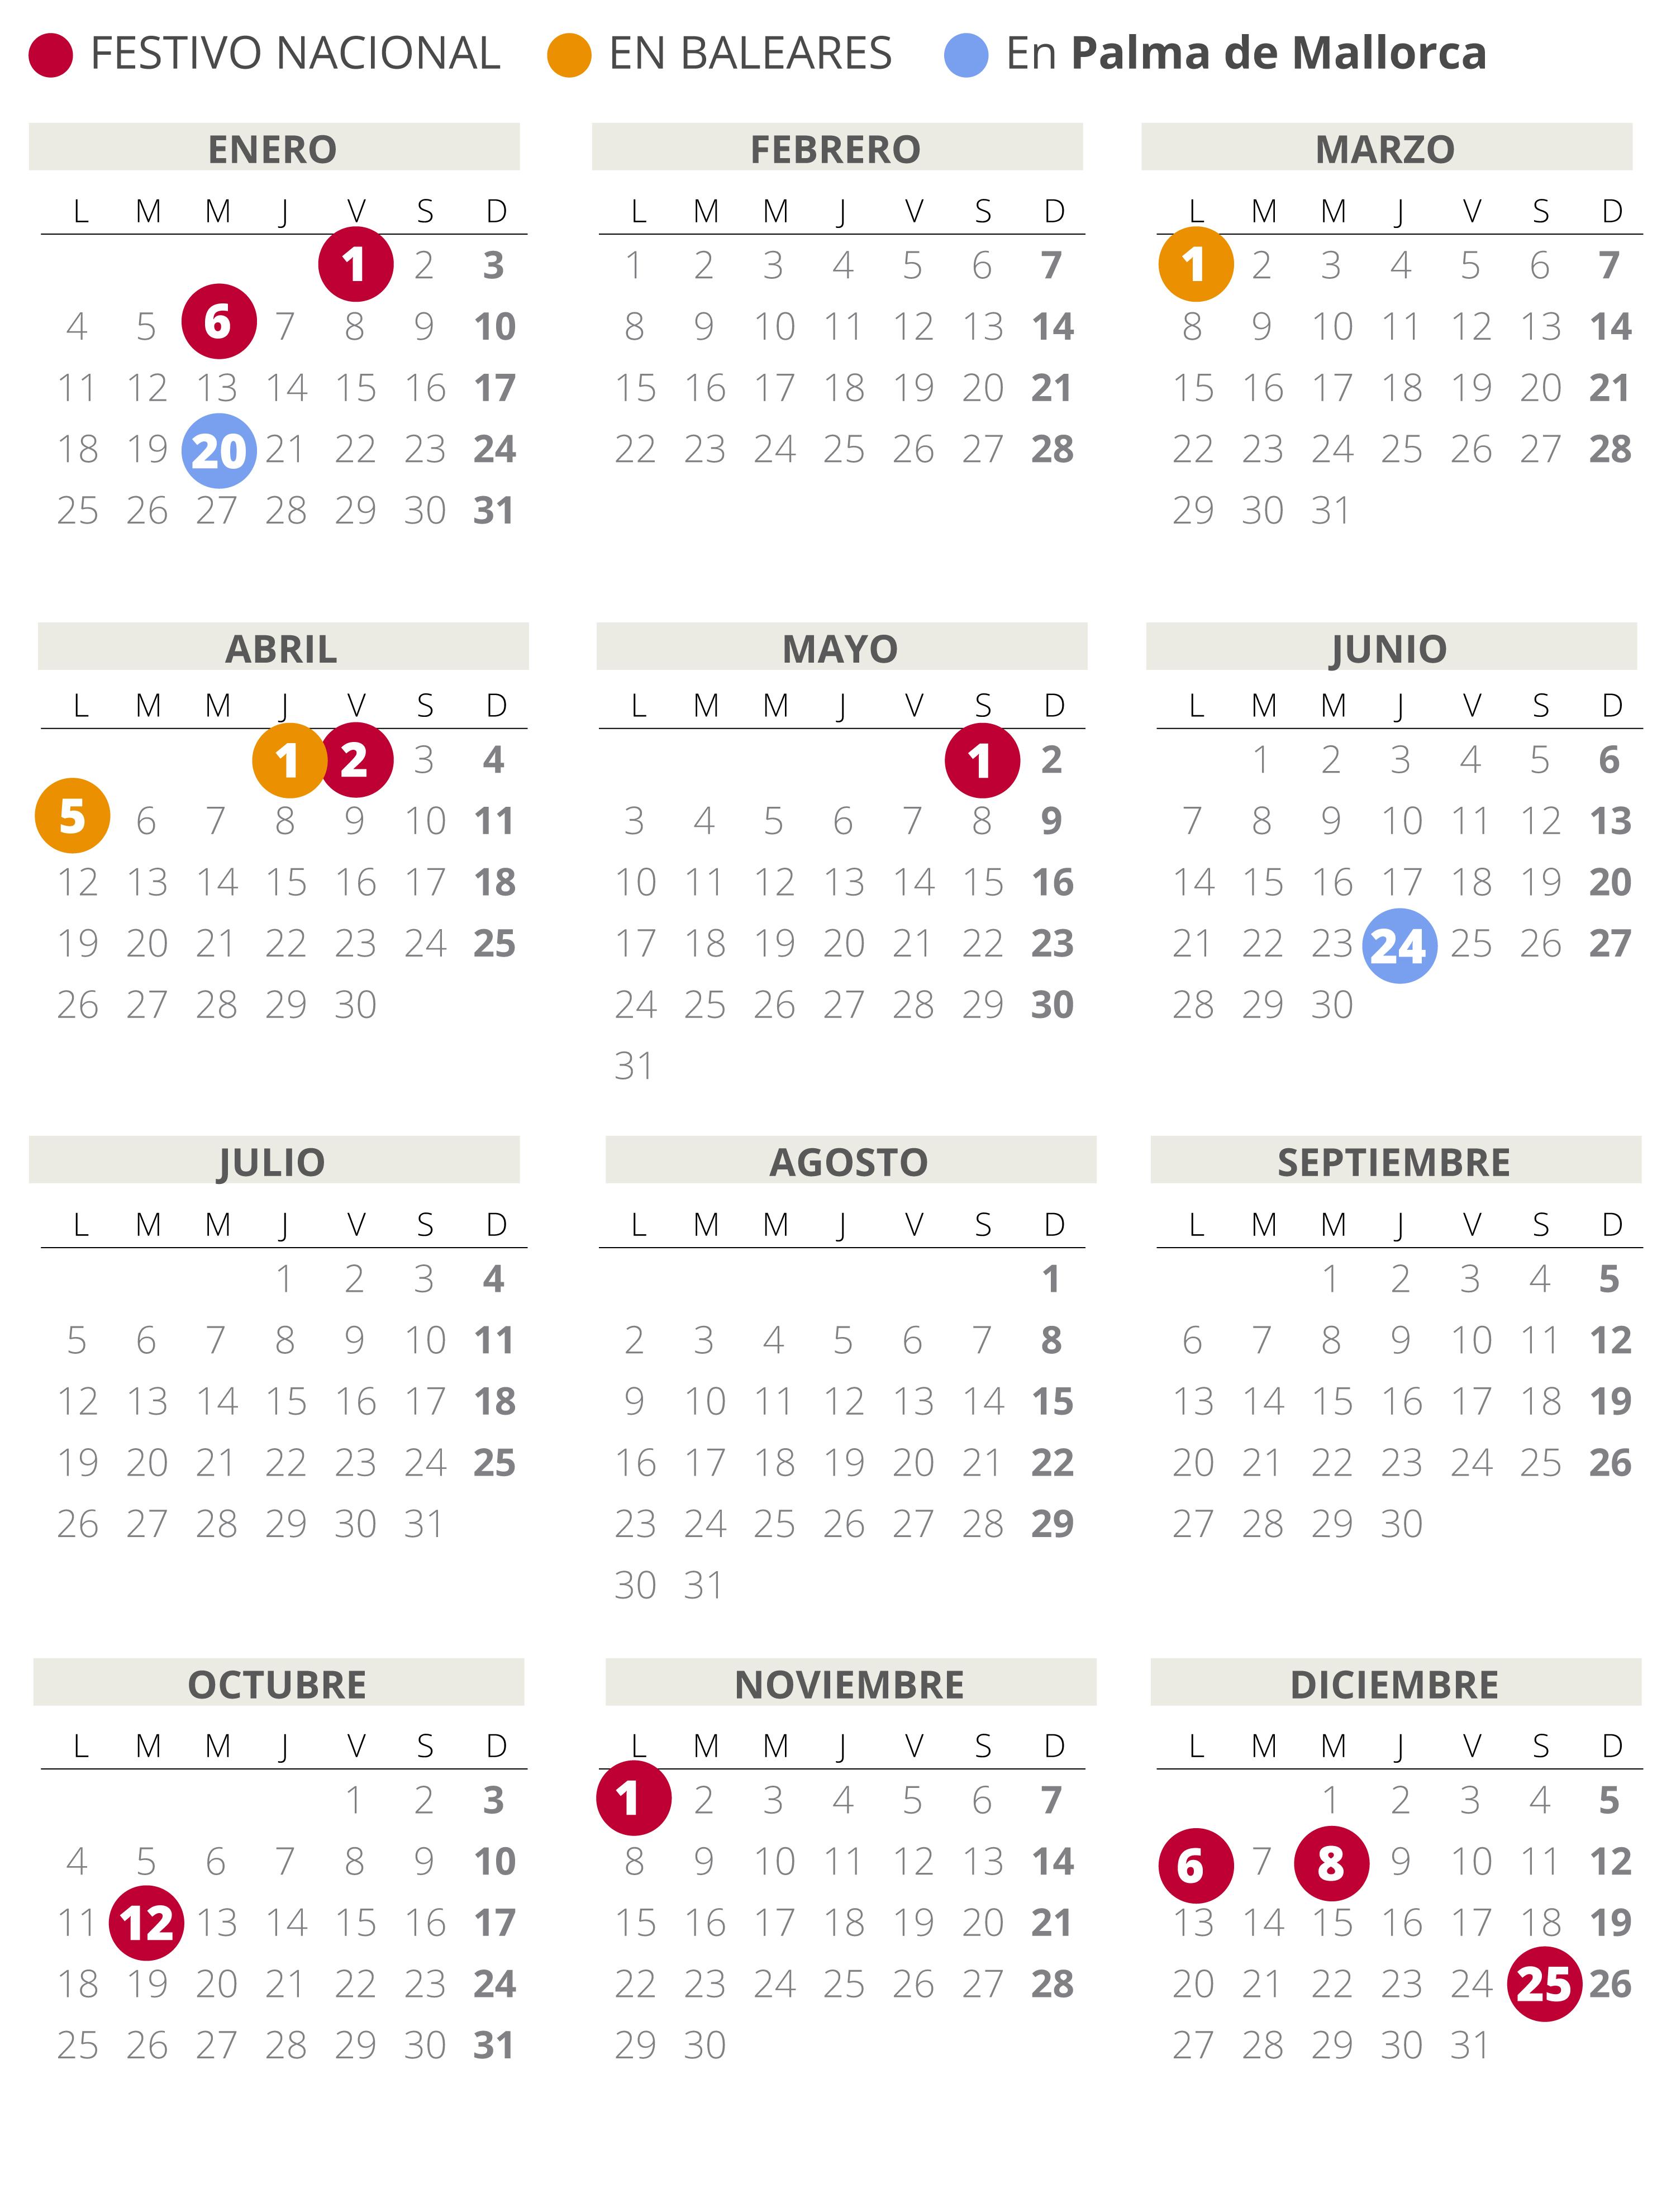 Calendario laboral de Palma de Mallorca del 2021.